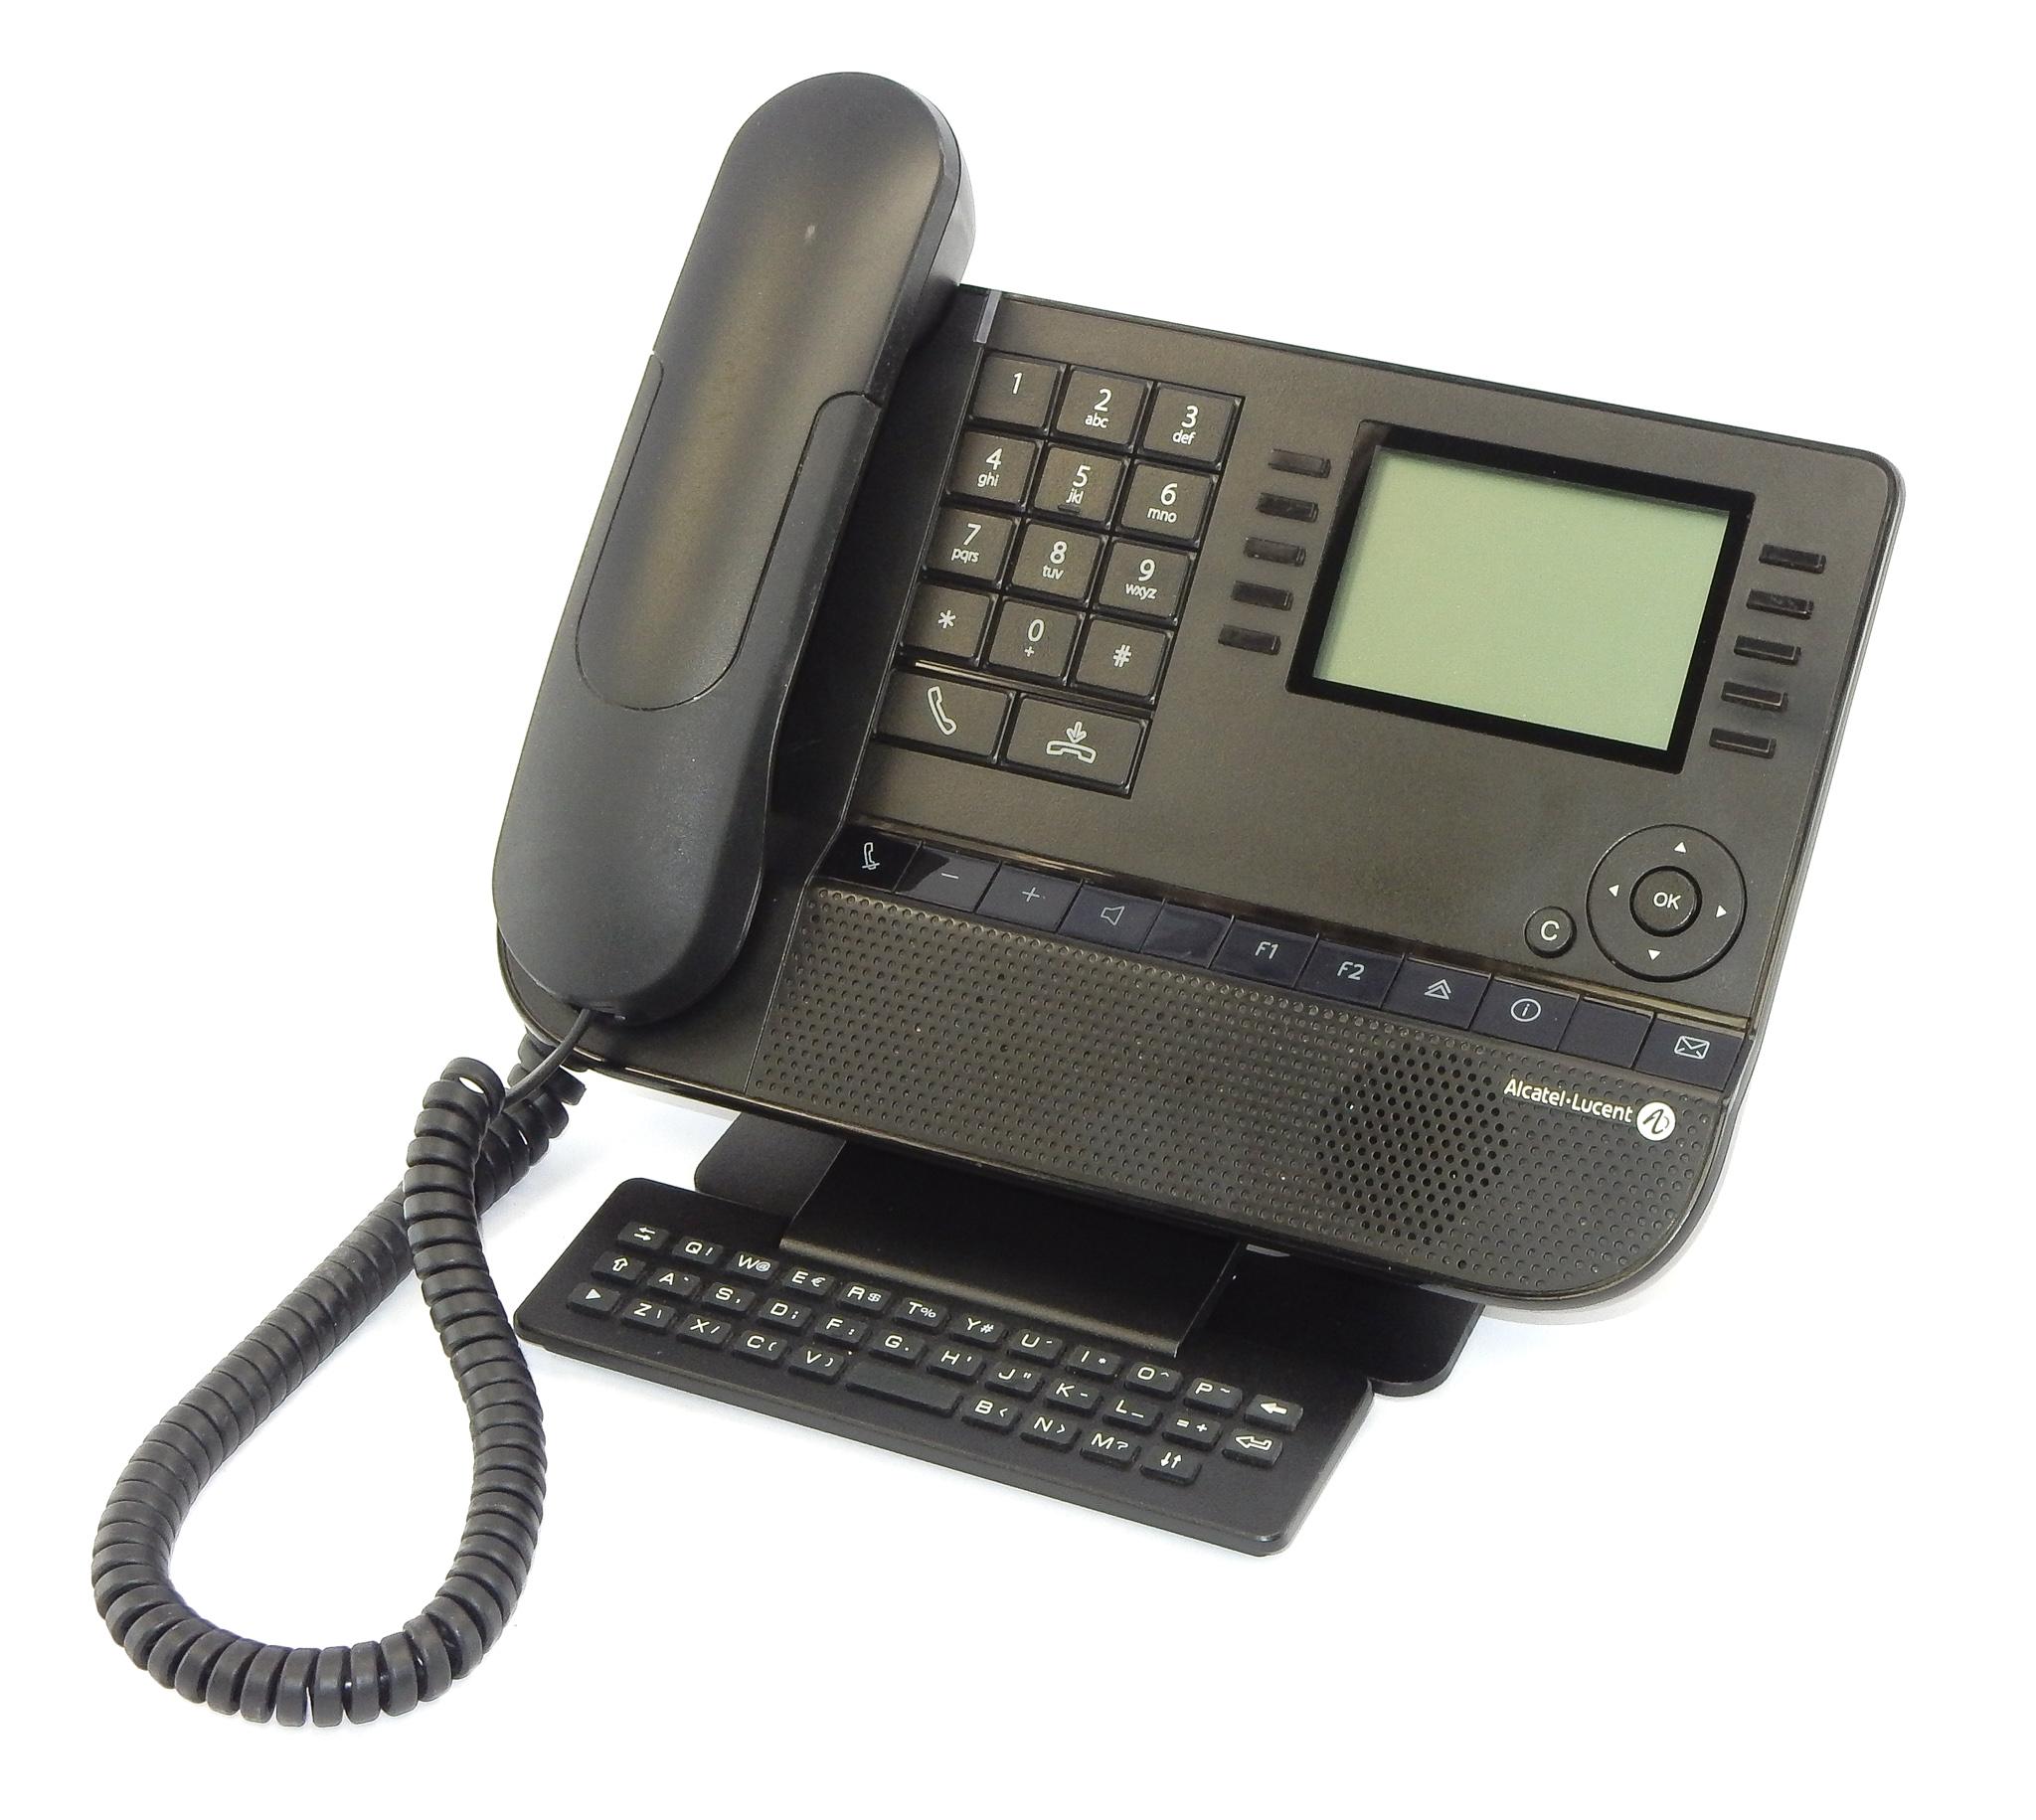 Alcatel-Lucent 8039 Premium DeskPhone w/ Qwerty keyboard